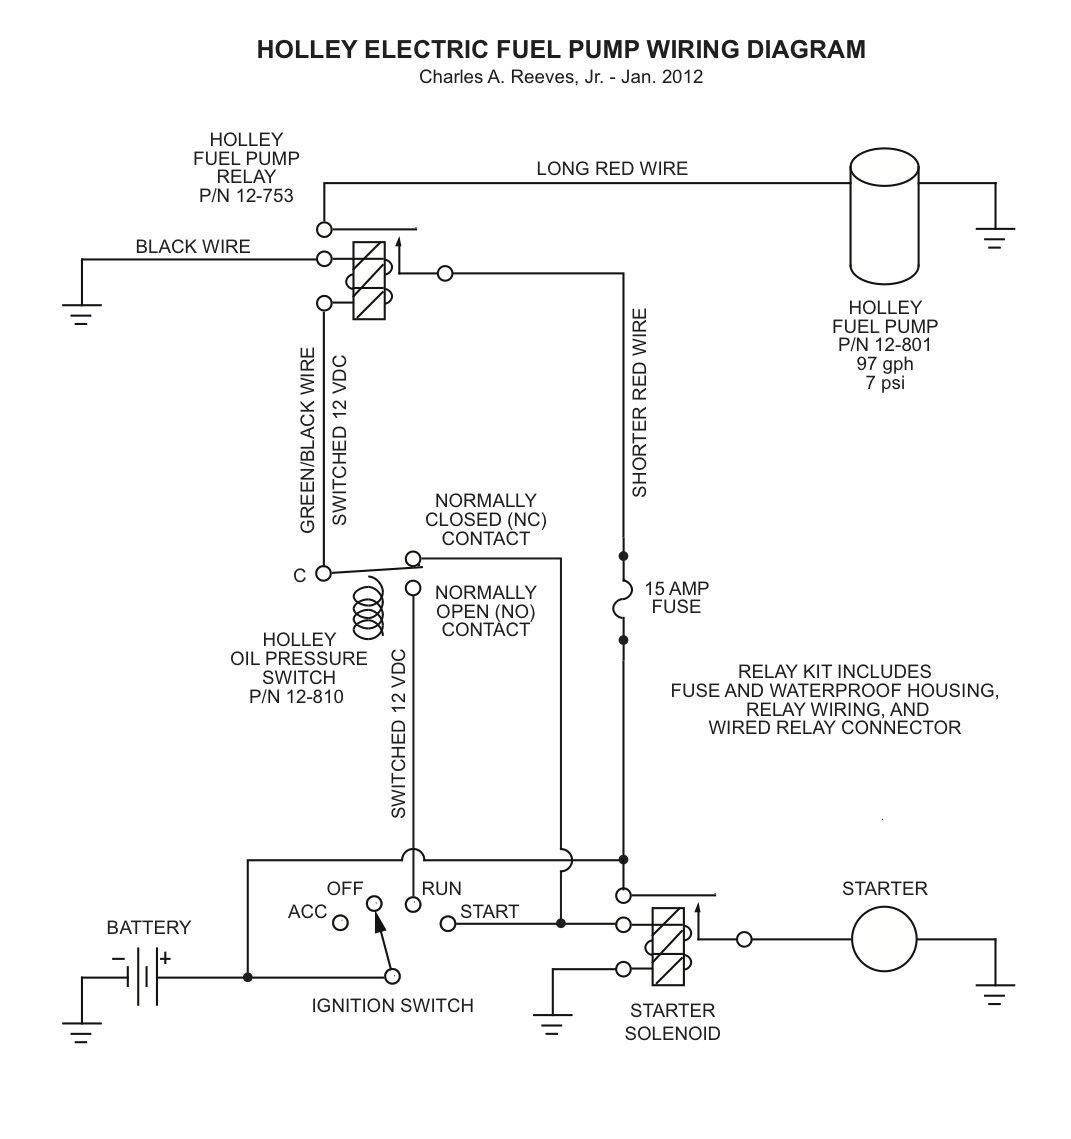 hight resolution of holley red fuel pump wiring diagram wiring diagram portal 93 honda civic hatchback fuel pump relay wiring diagram electric fuel pump relay wiring diagram